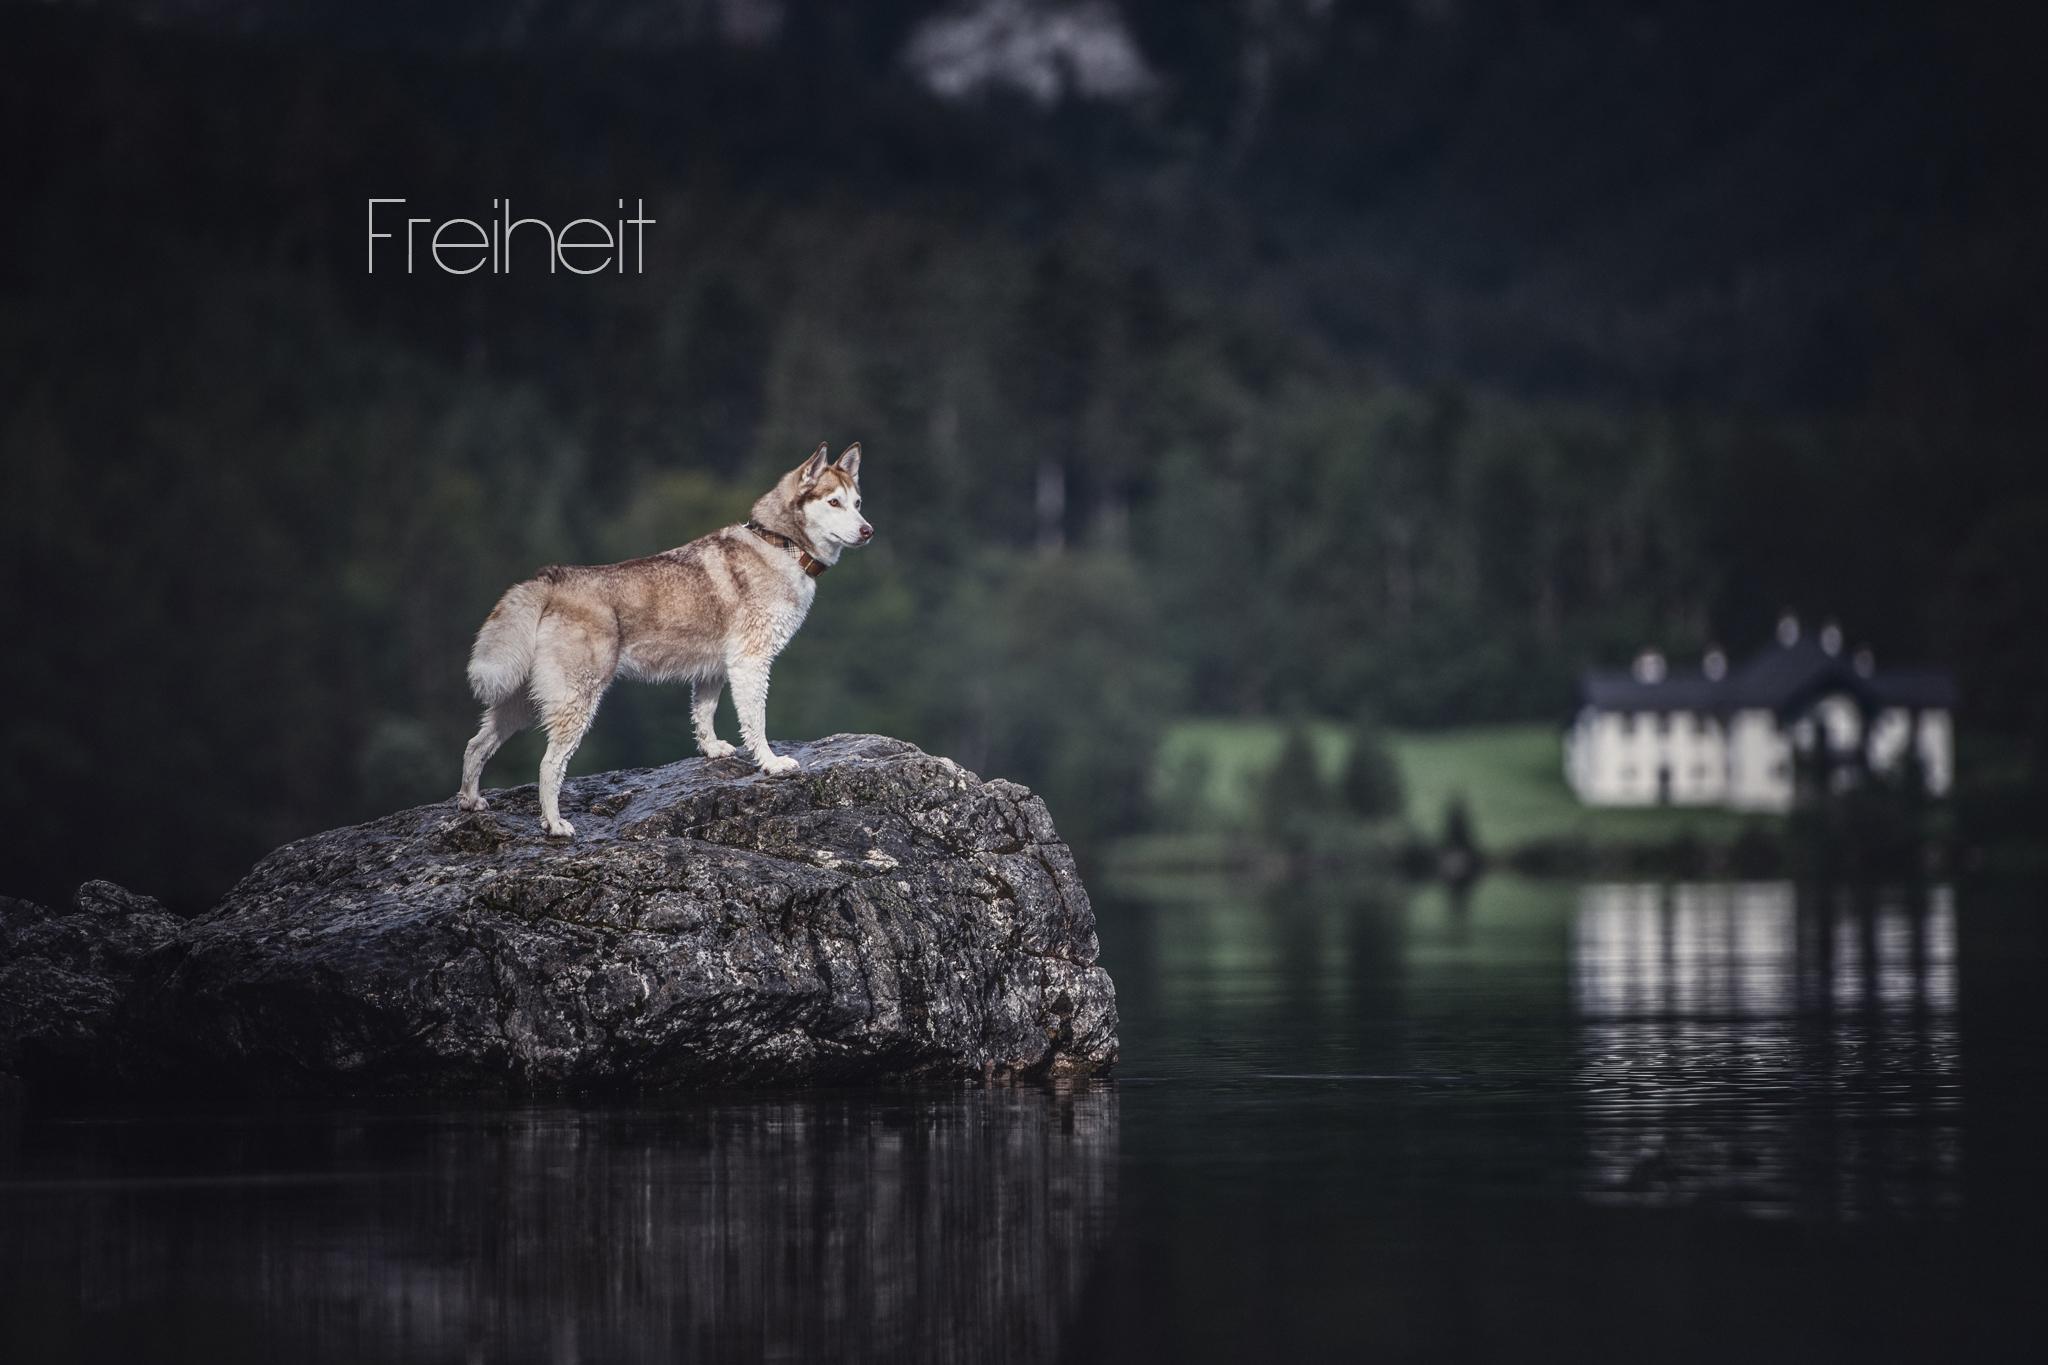 Fotograf Hundefotograf Peoplefotograf Tierfotograf Oberösterreich Österreich